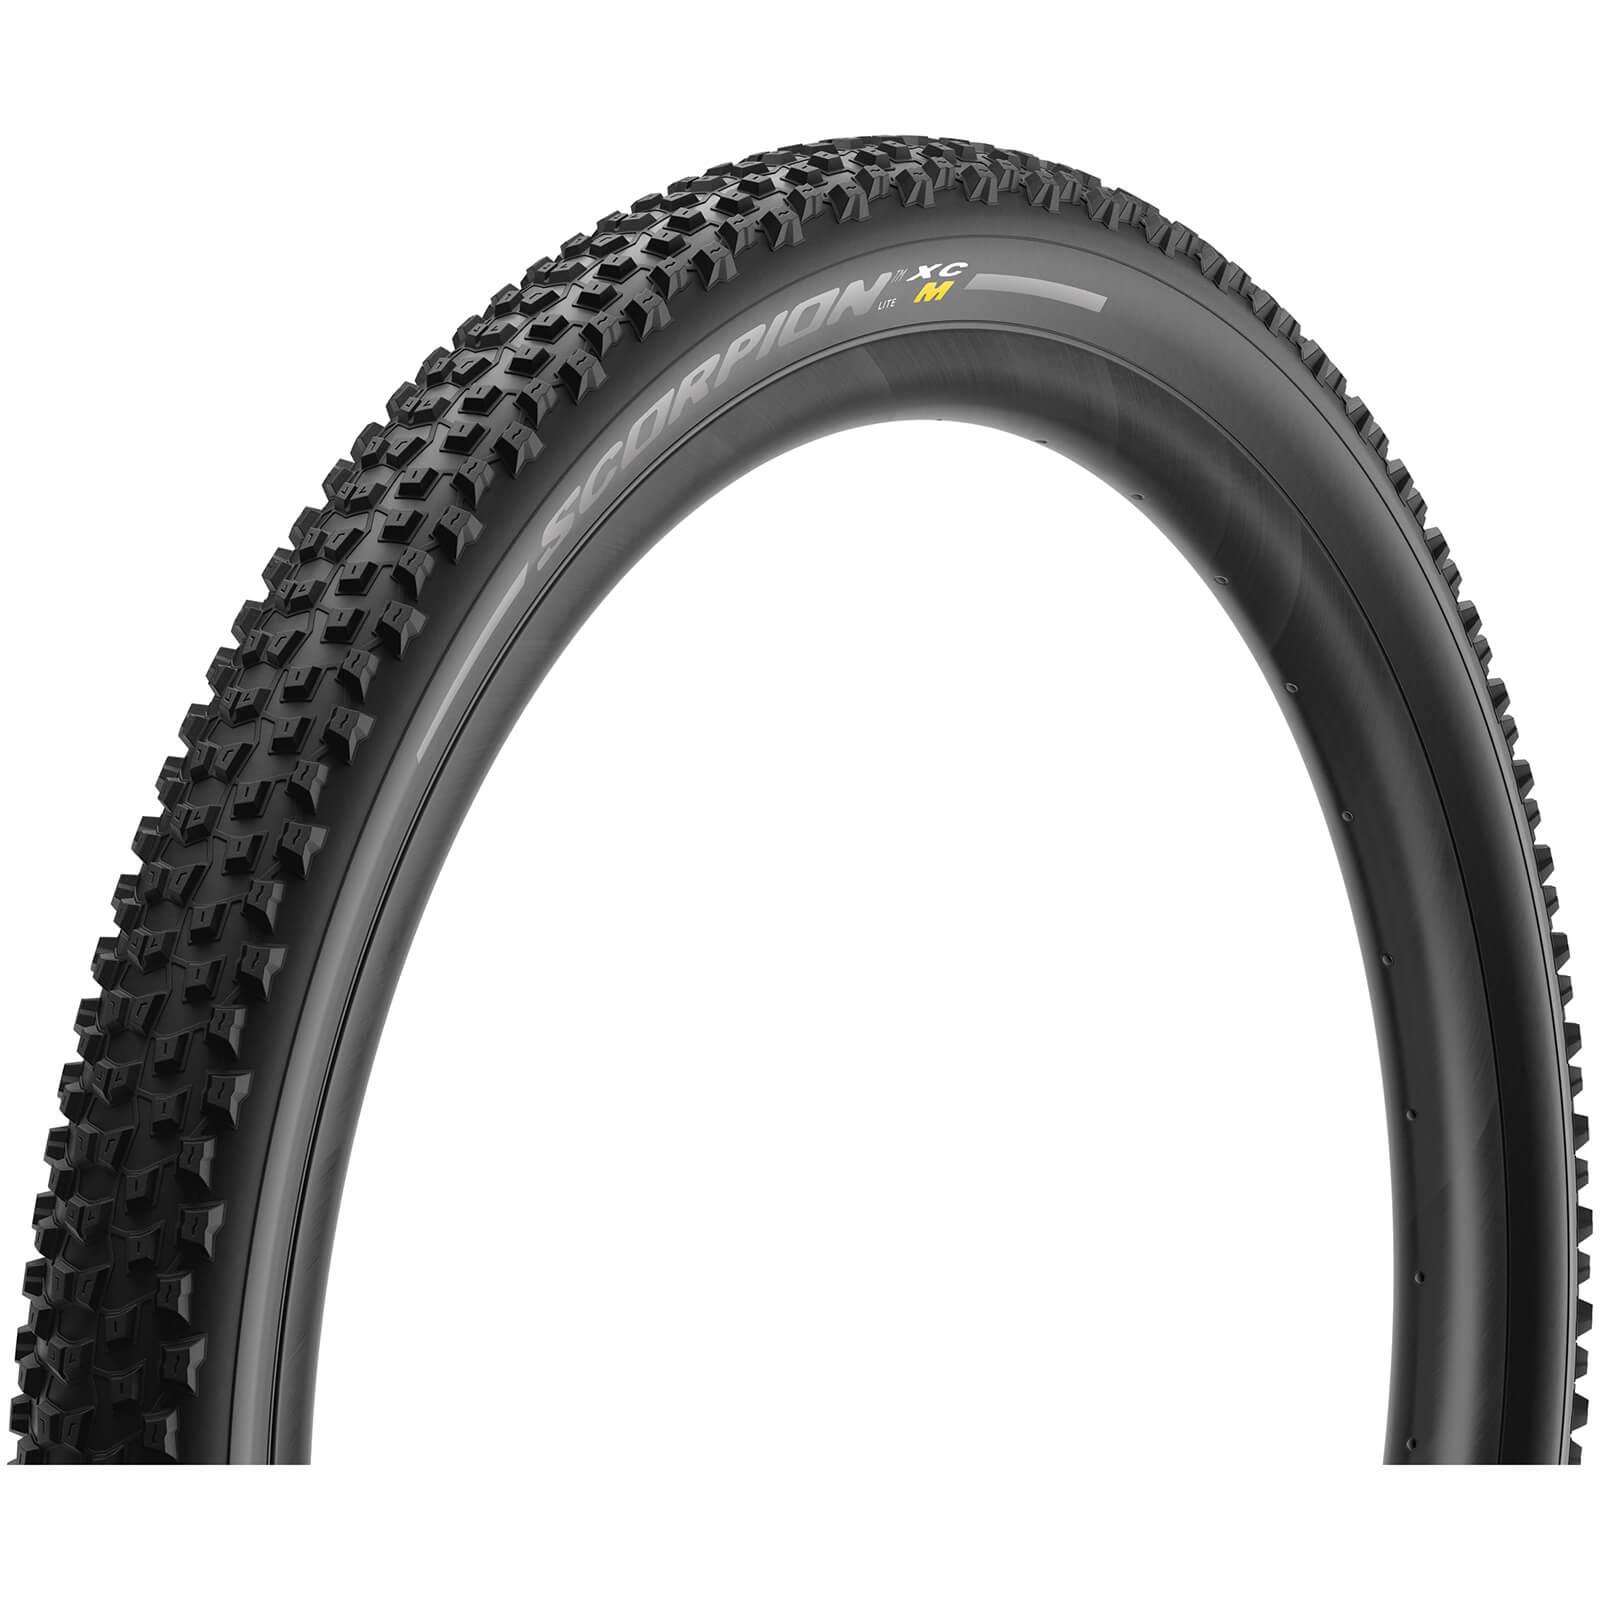 Pirelli Scorpion™ XC M MTB Tyre - 2.2In